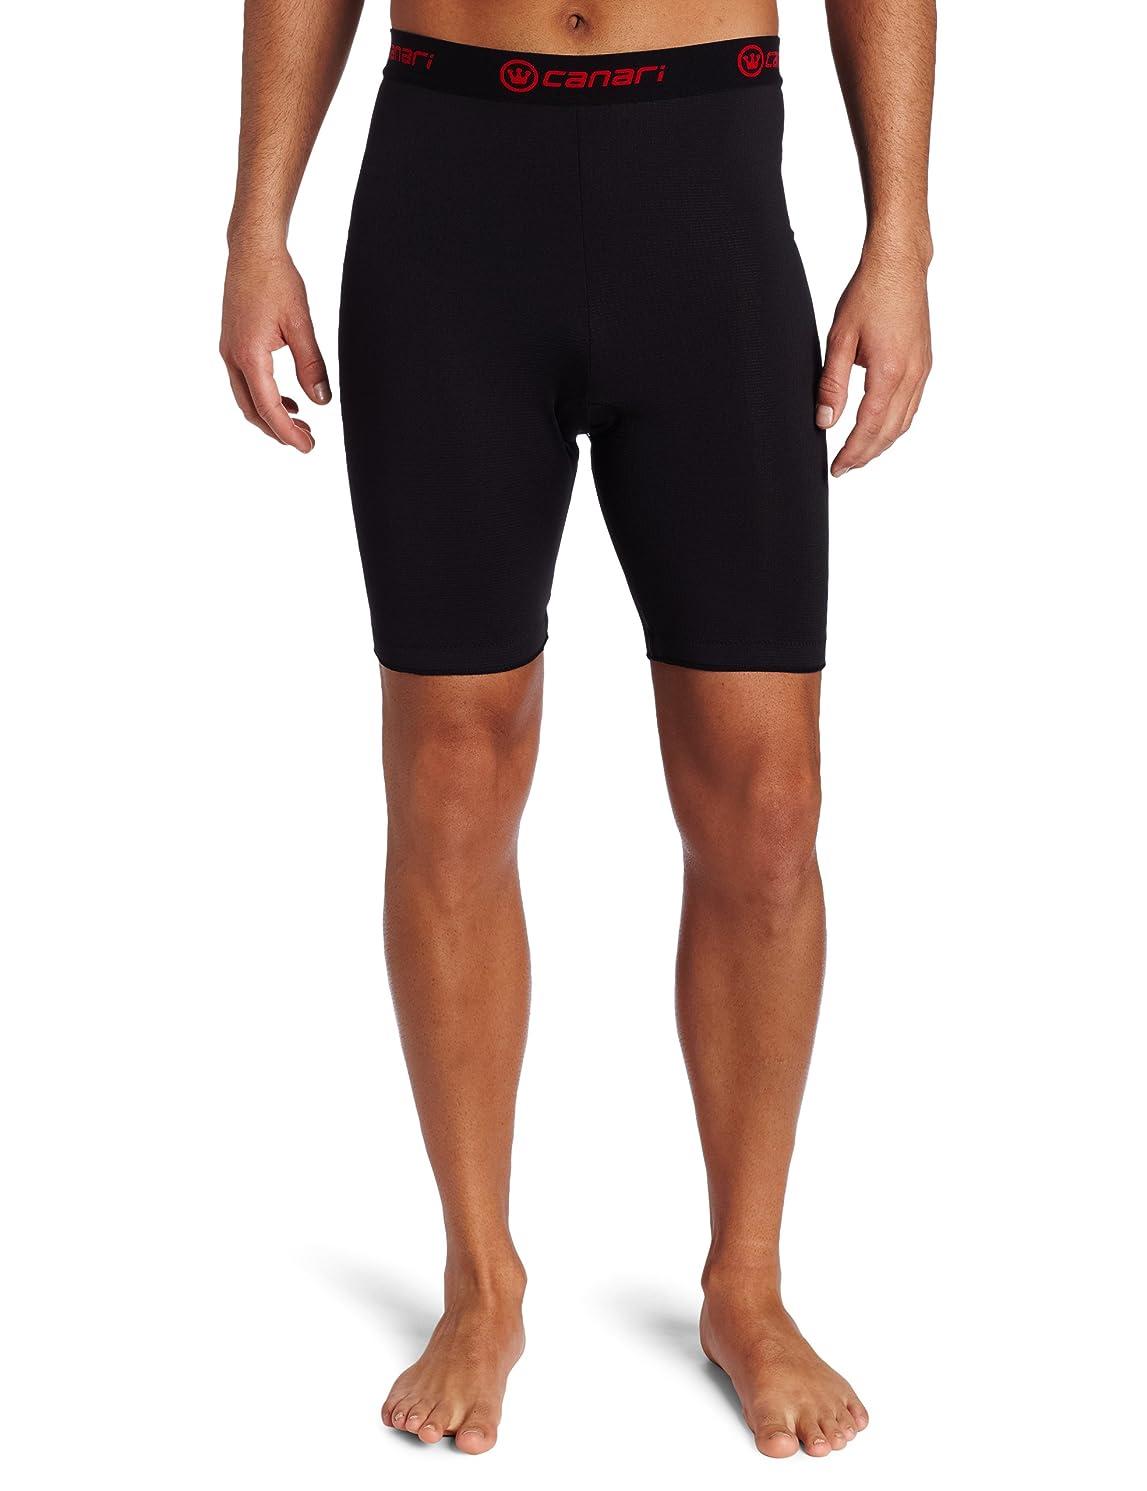 Canari Cyclewear Men's M Gel Cycle Liner Padded Cycling Short